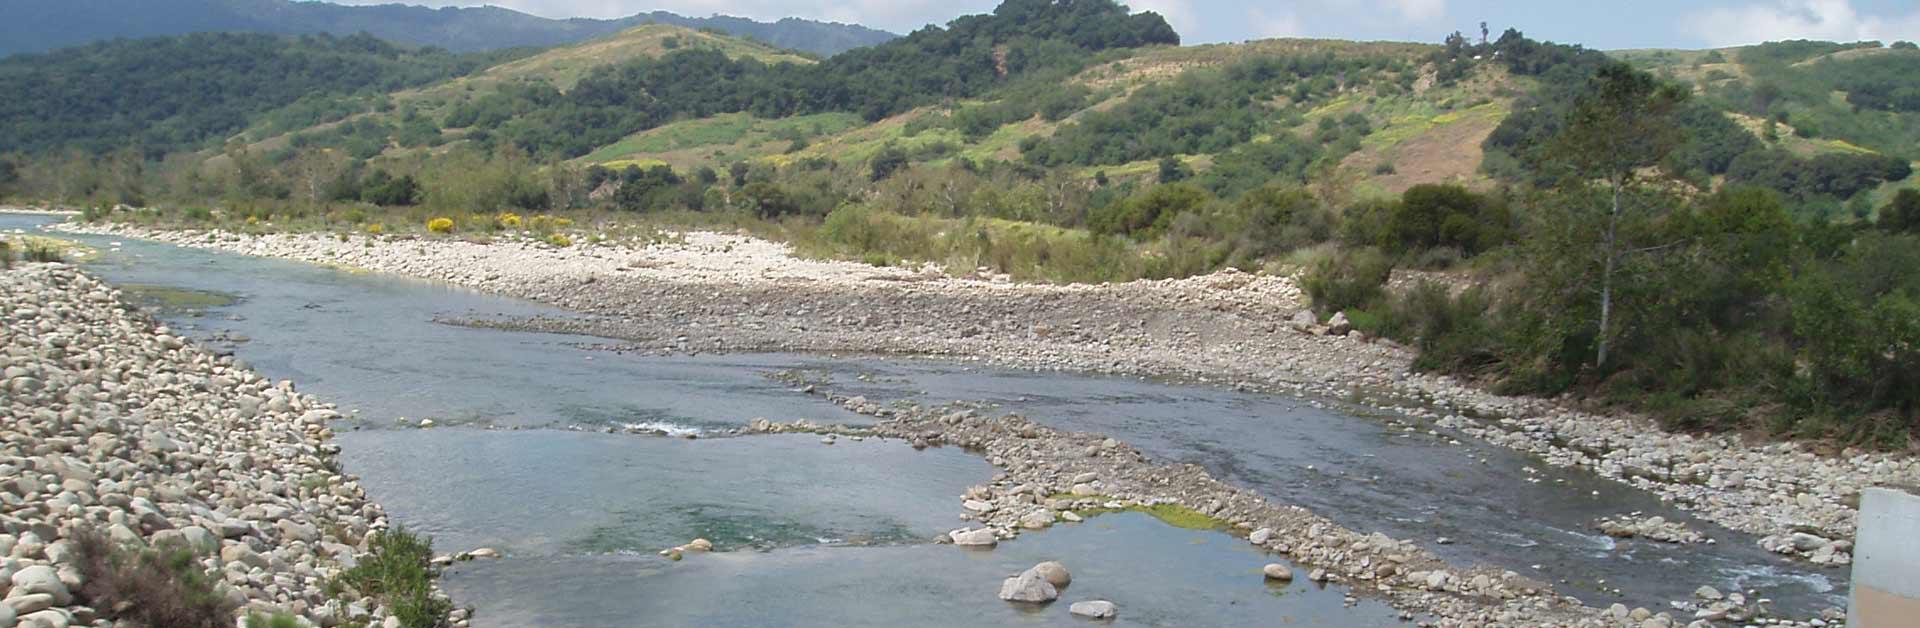 Ventura River.